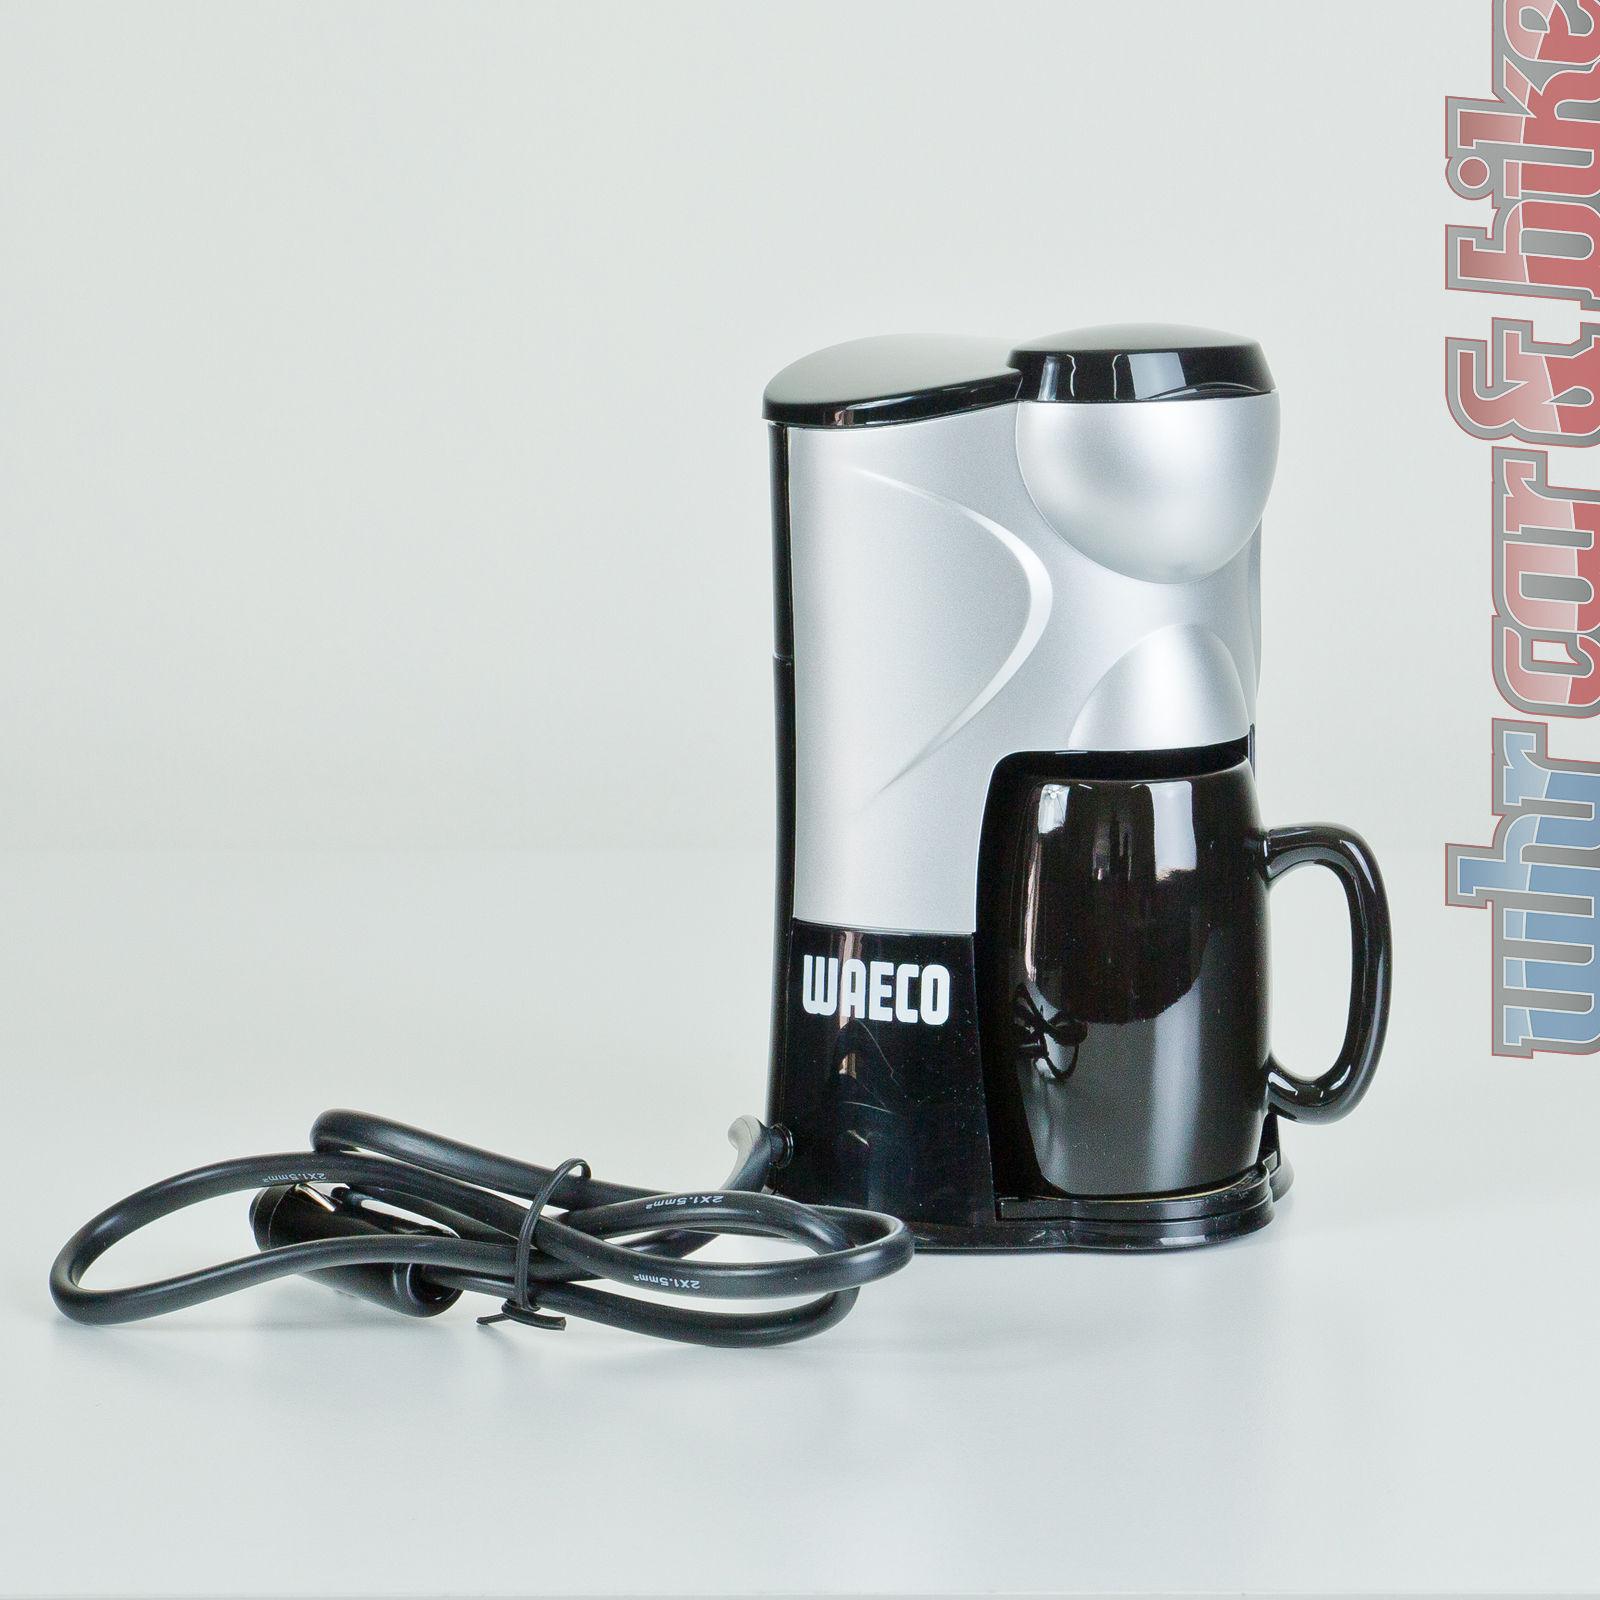 Waeco MC-01 12V 180W KFZ 1-Tassen Kaffeemaschine PerfectCoffee LKW Auto Caravan